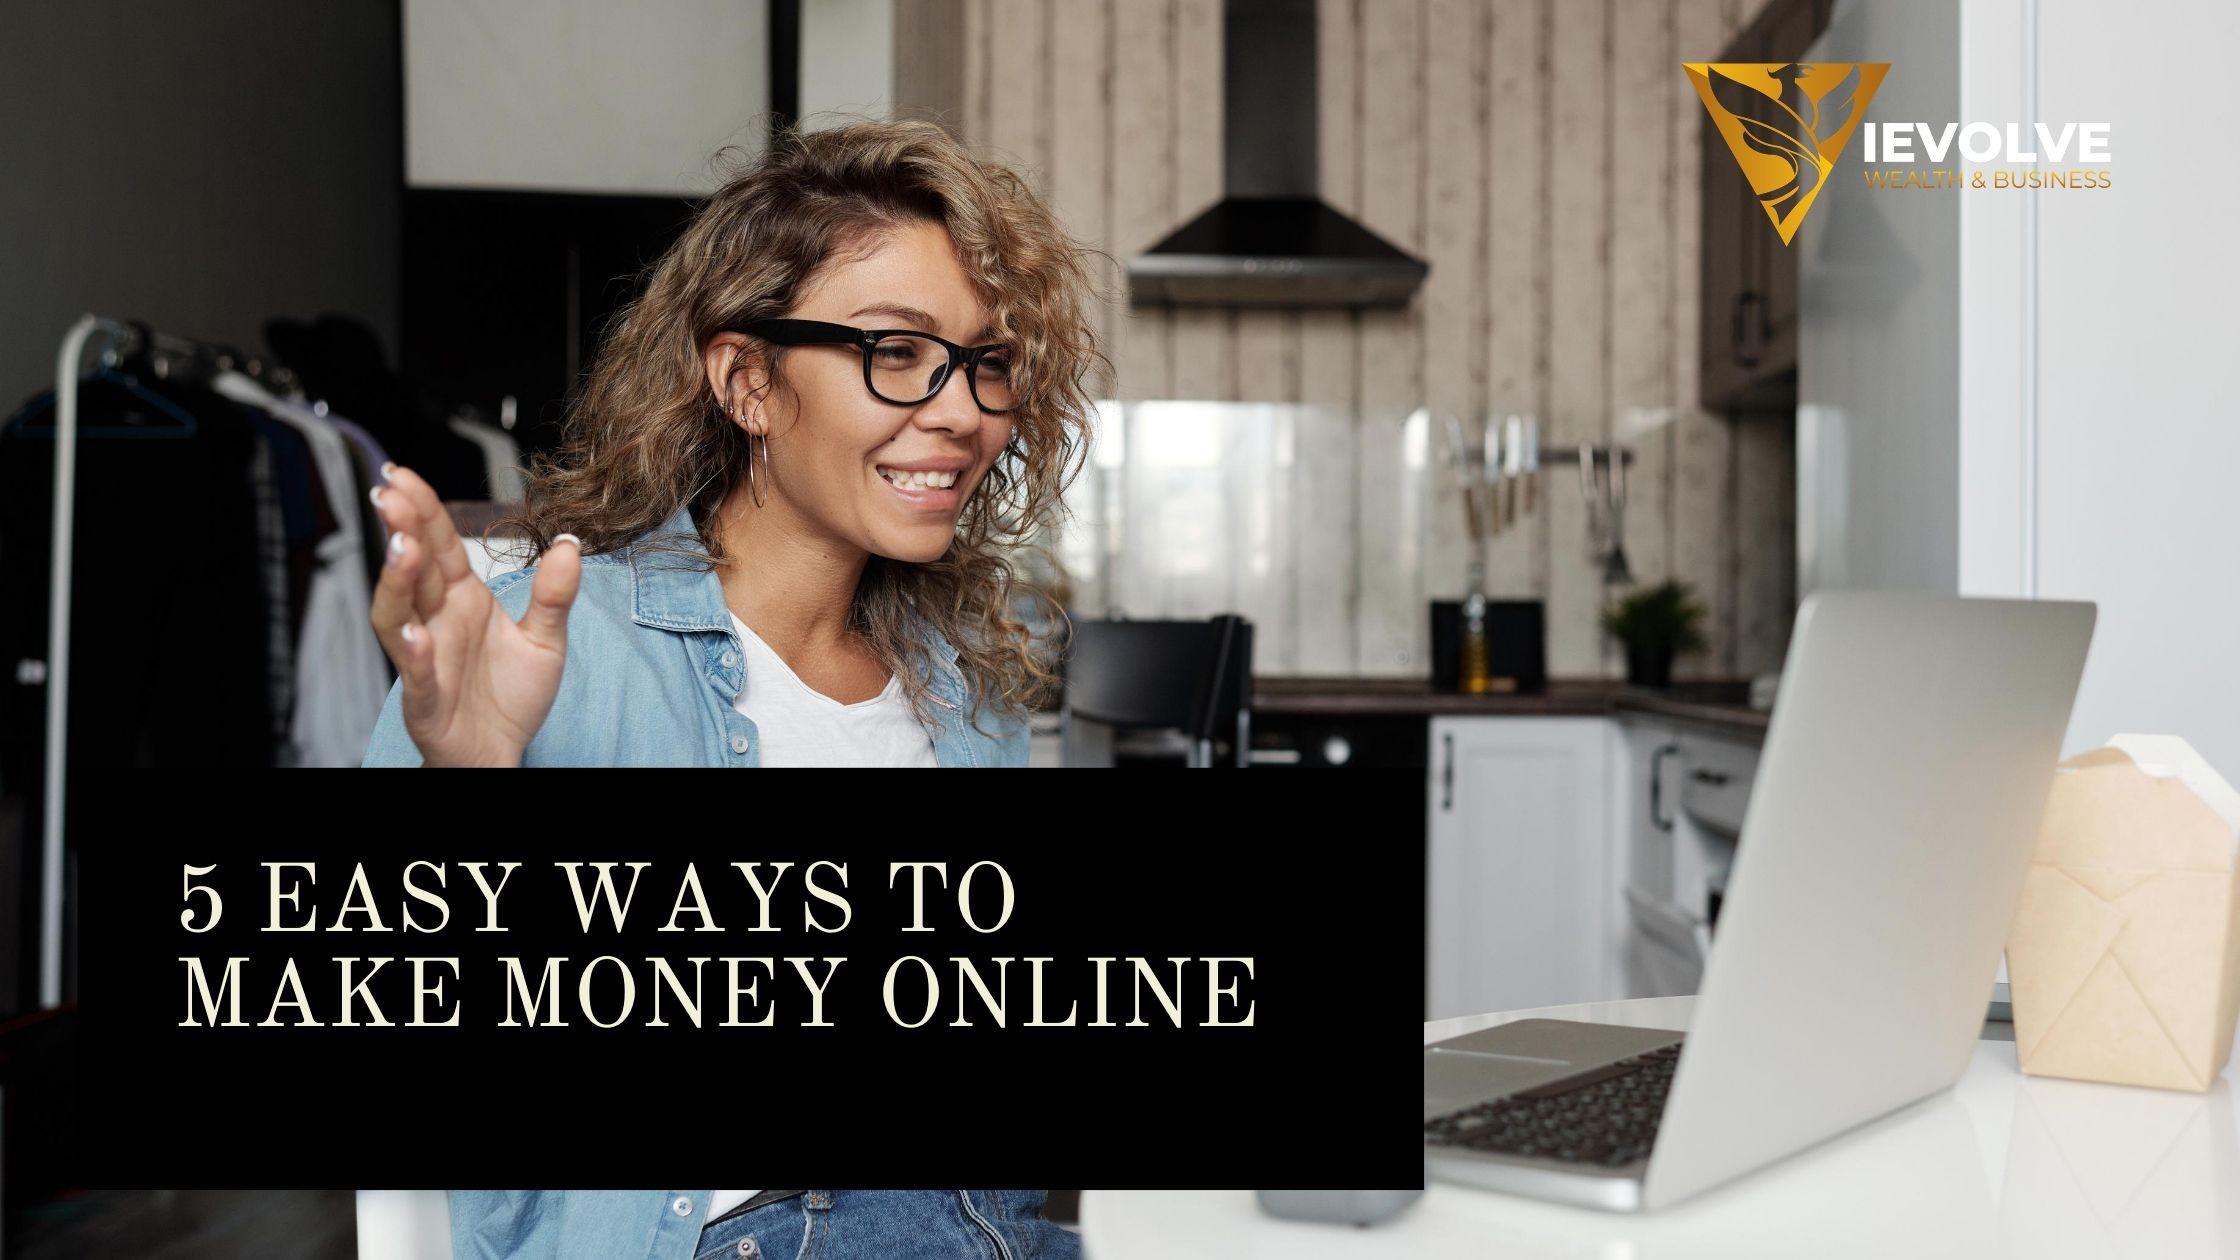 5 Easy Ways to Make Money Online